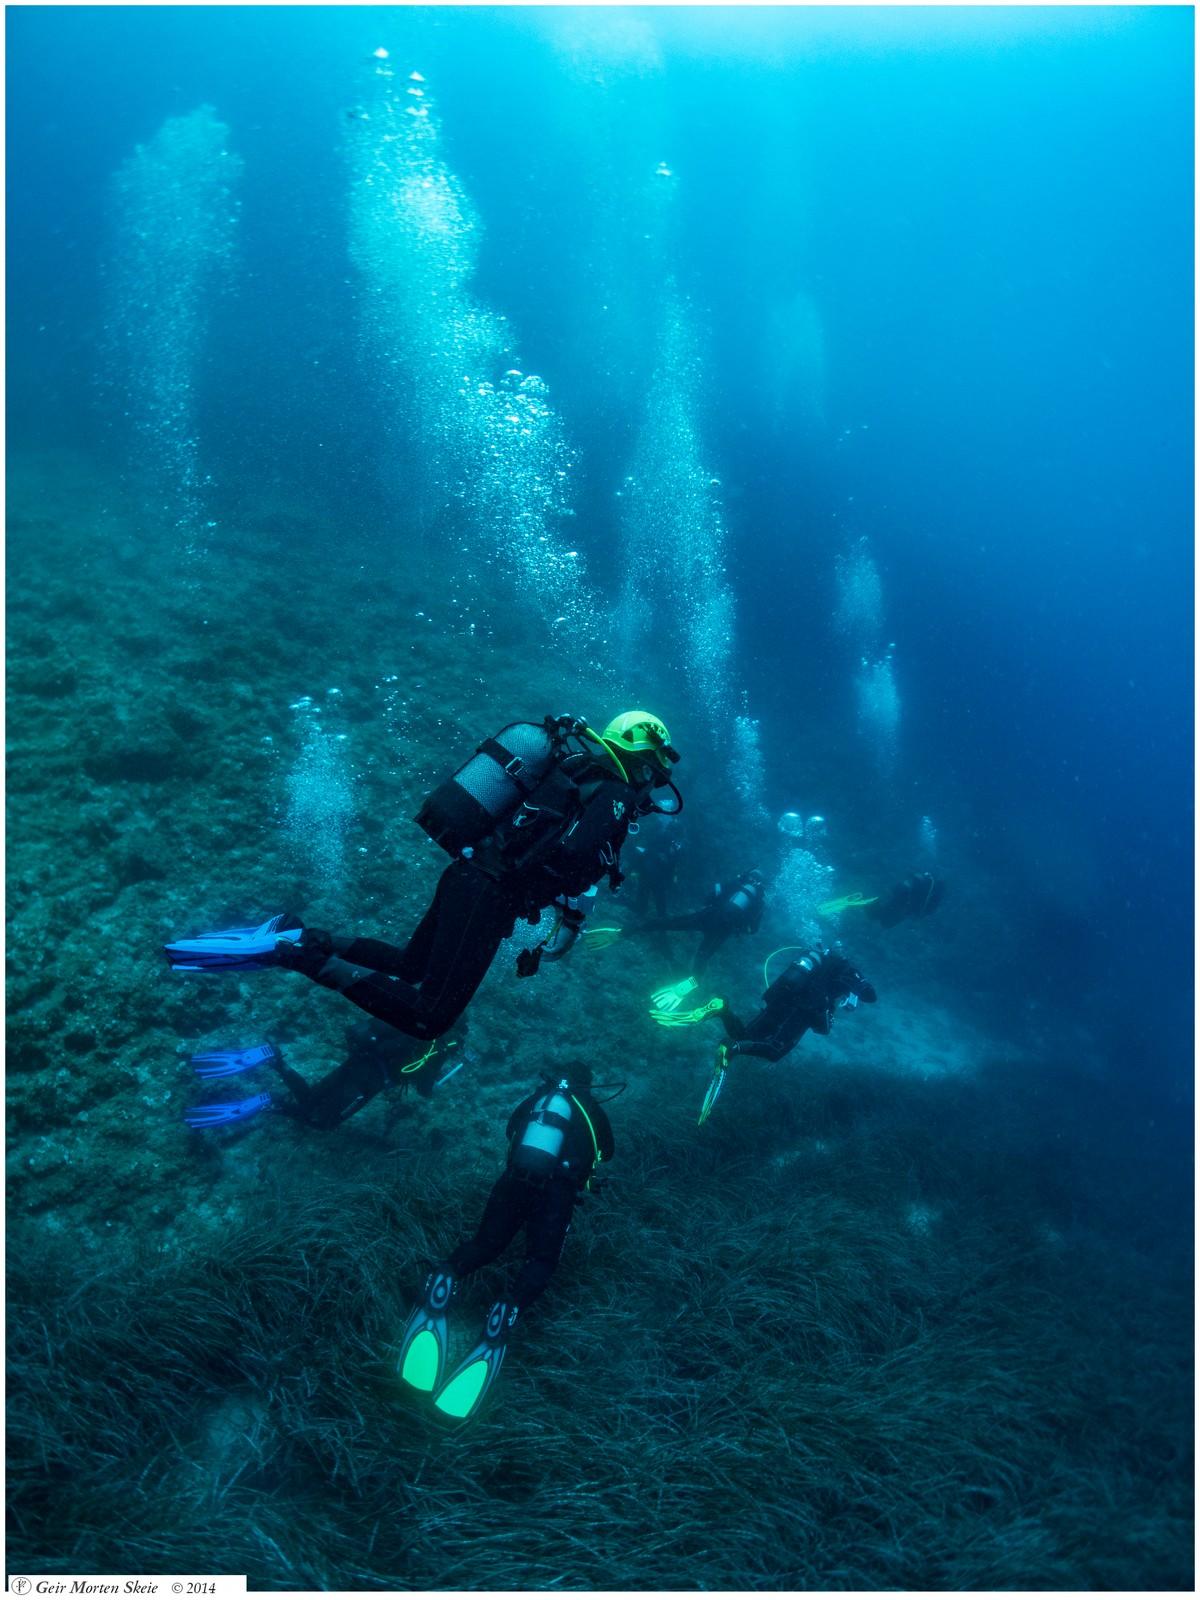 Alonissos, Alonnisos, Alonissos Triton Dive, Advanced Open Water Diver